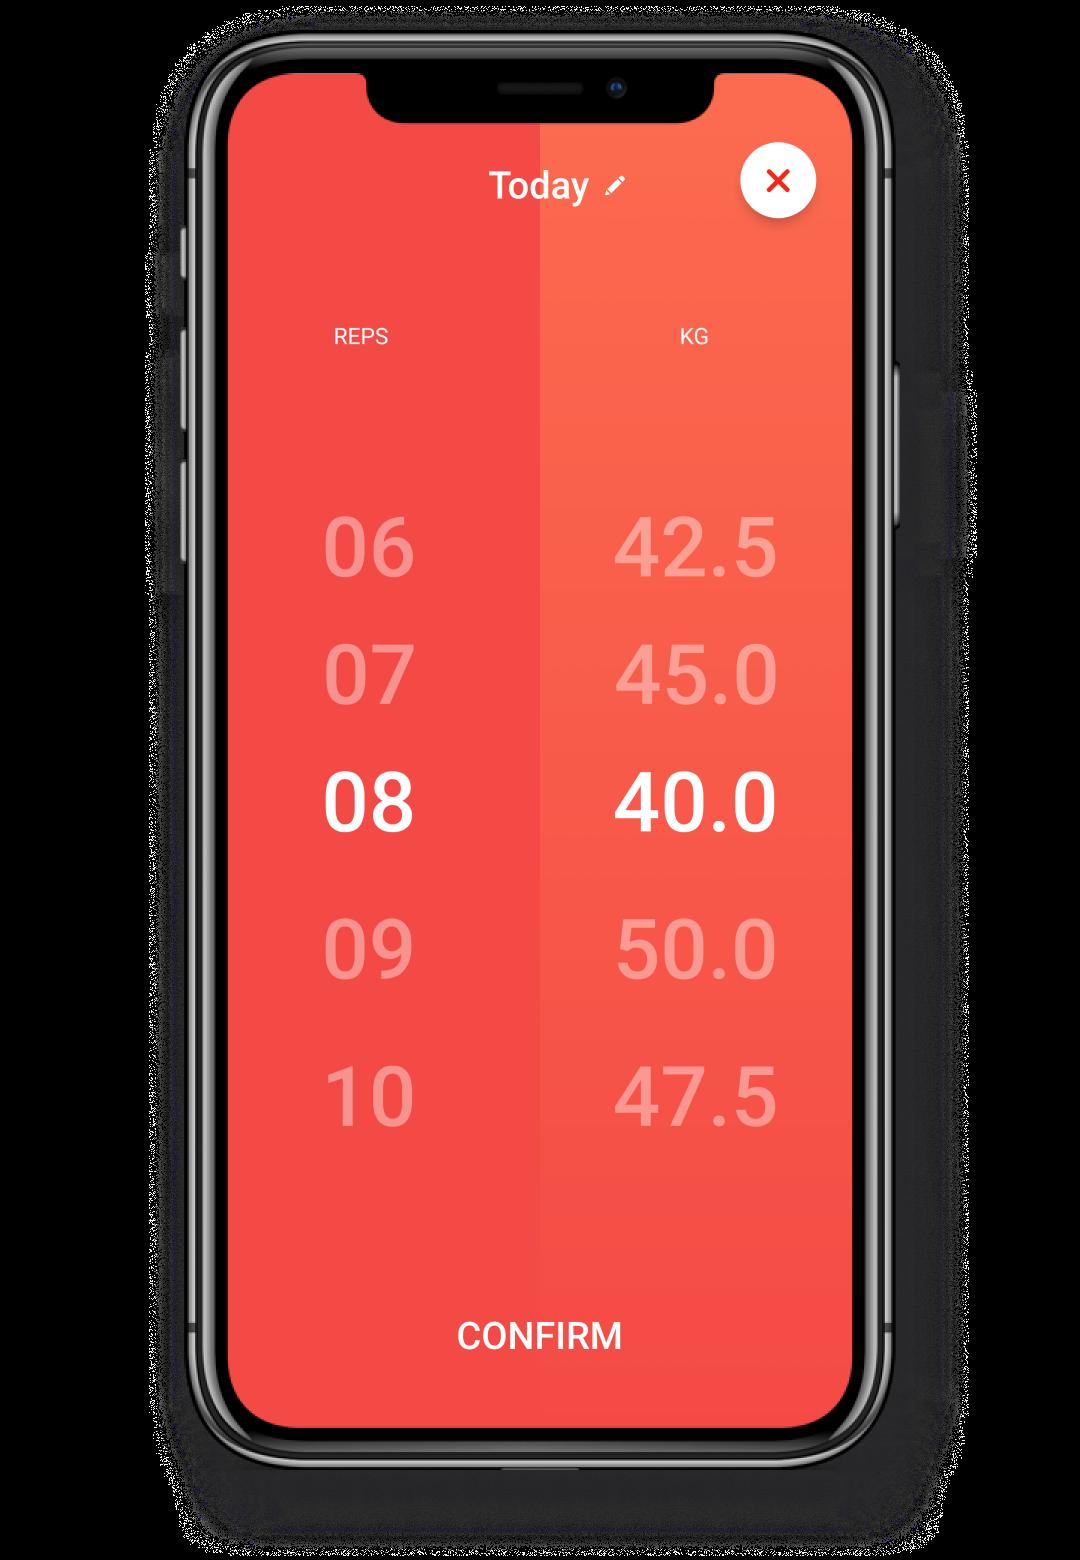 Screenshot showcasing the weight selection flow